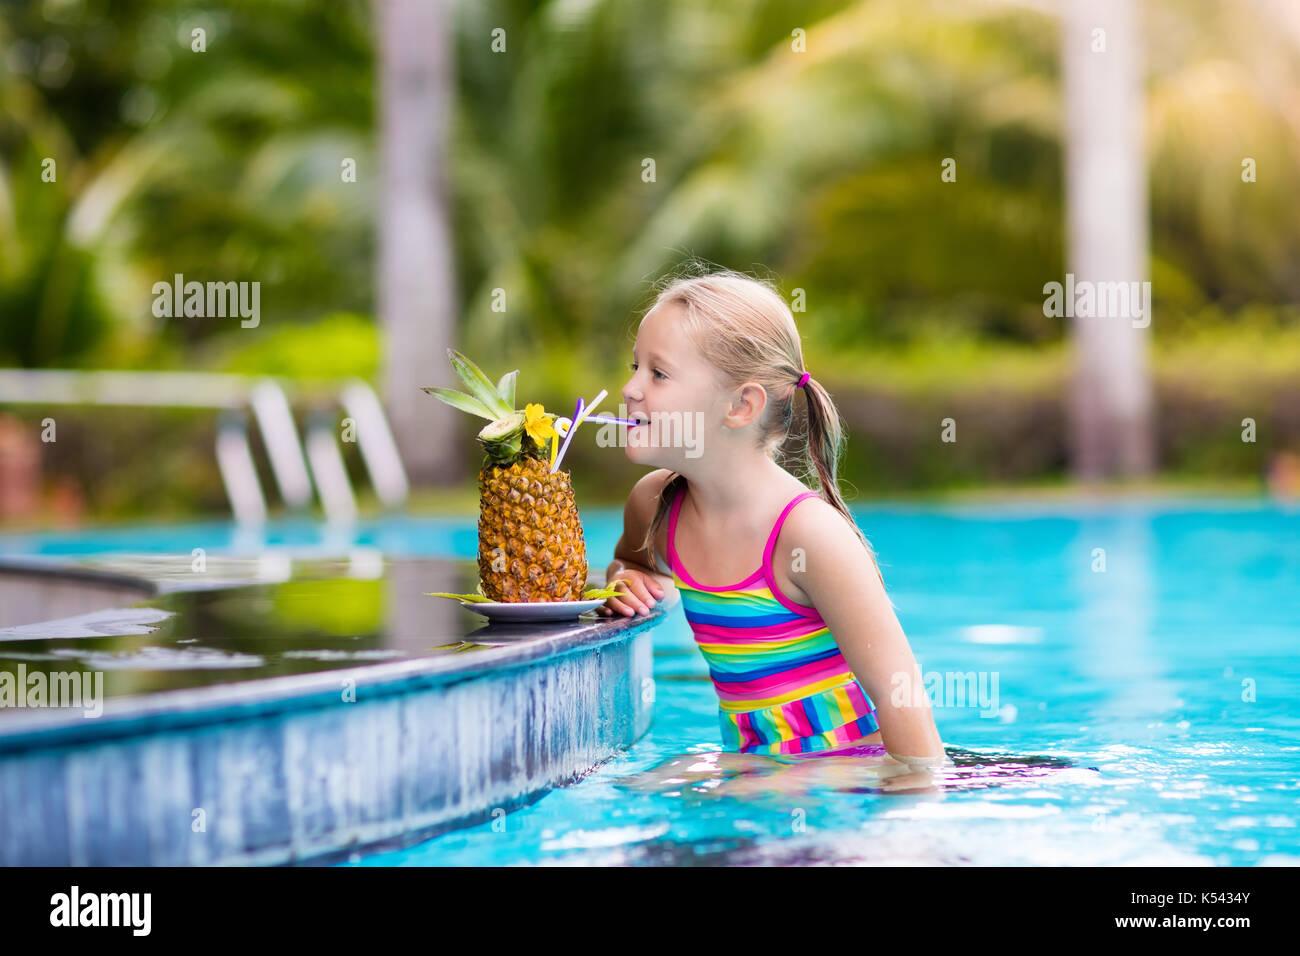 Family Drinking Fresh Fruit Juice Stock Photos Family Drinking Fresh Fruit Juice Stock Images